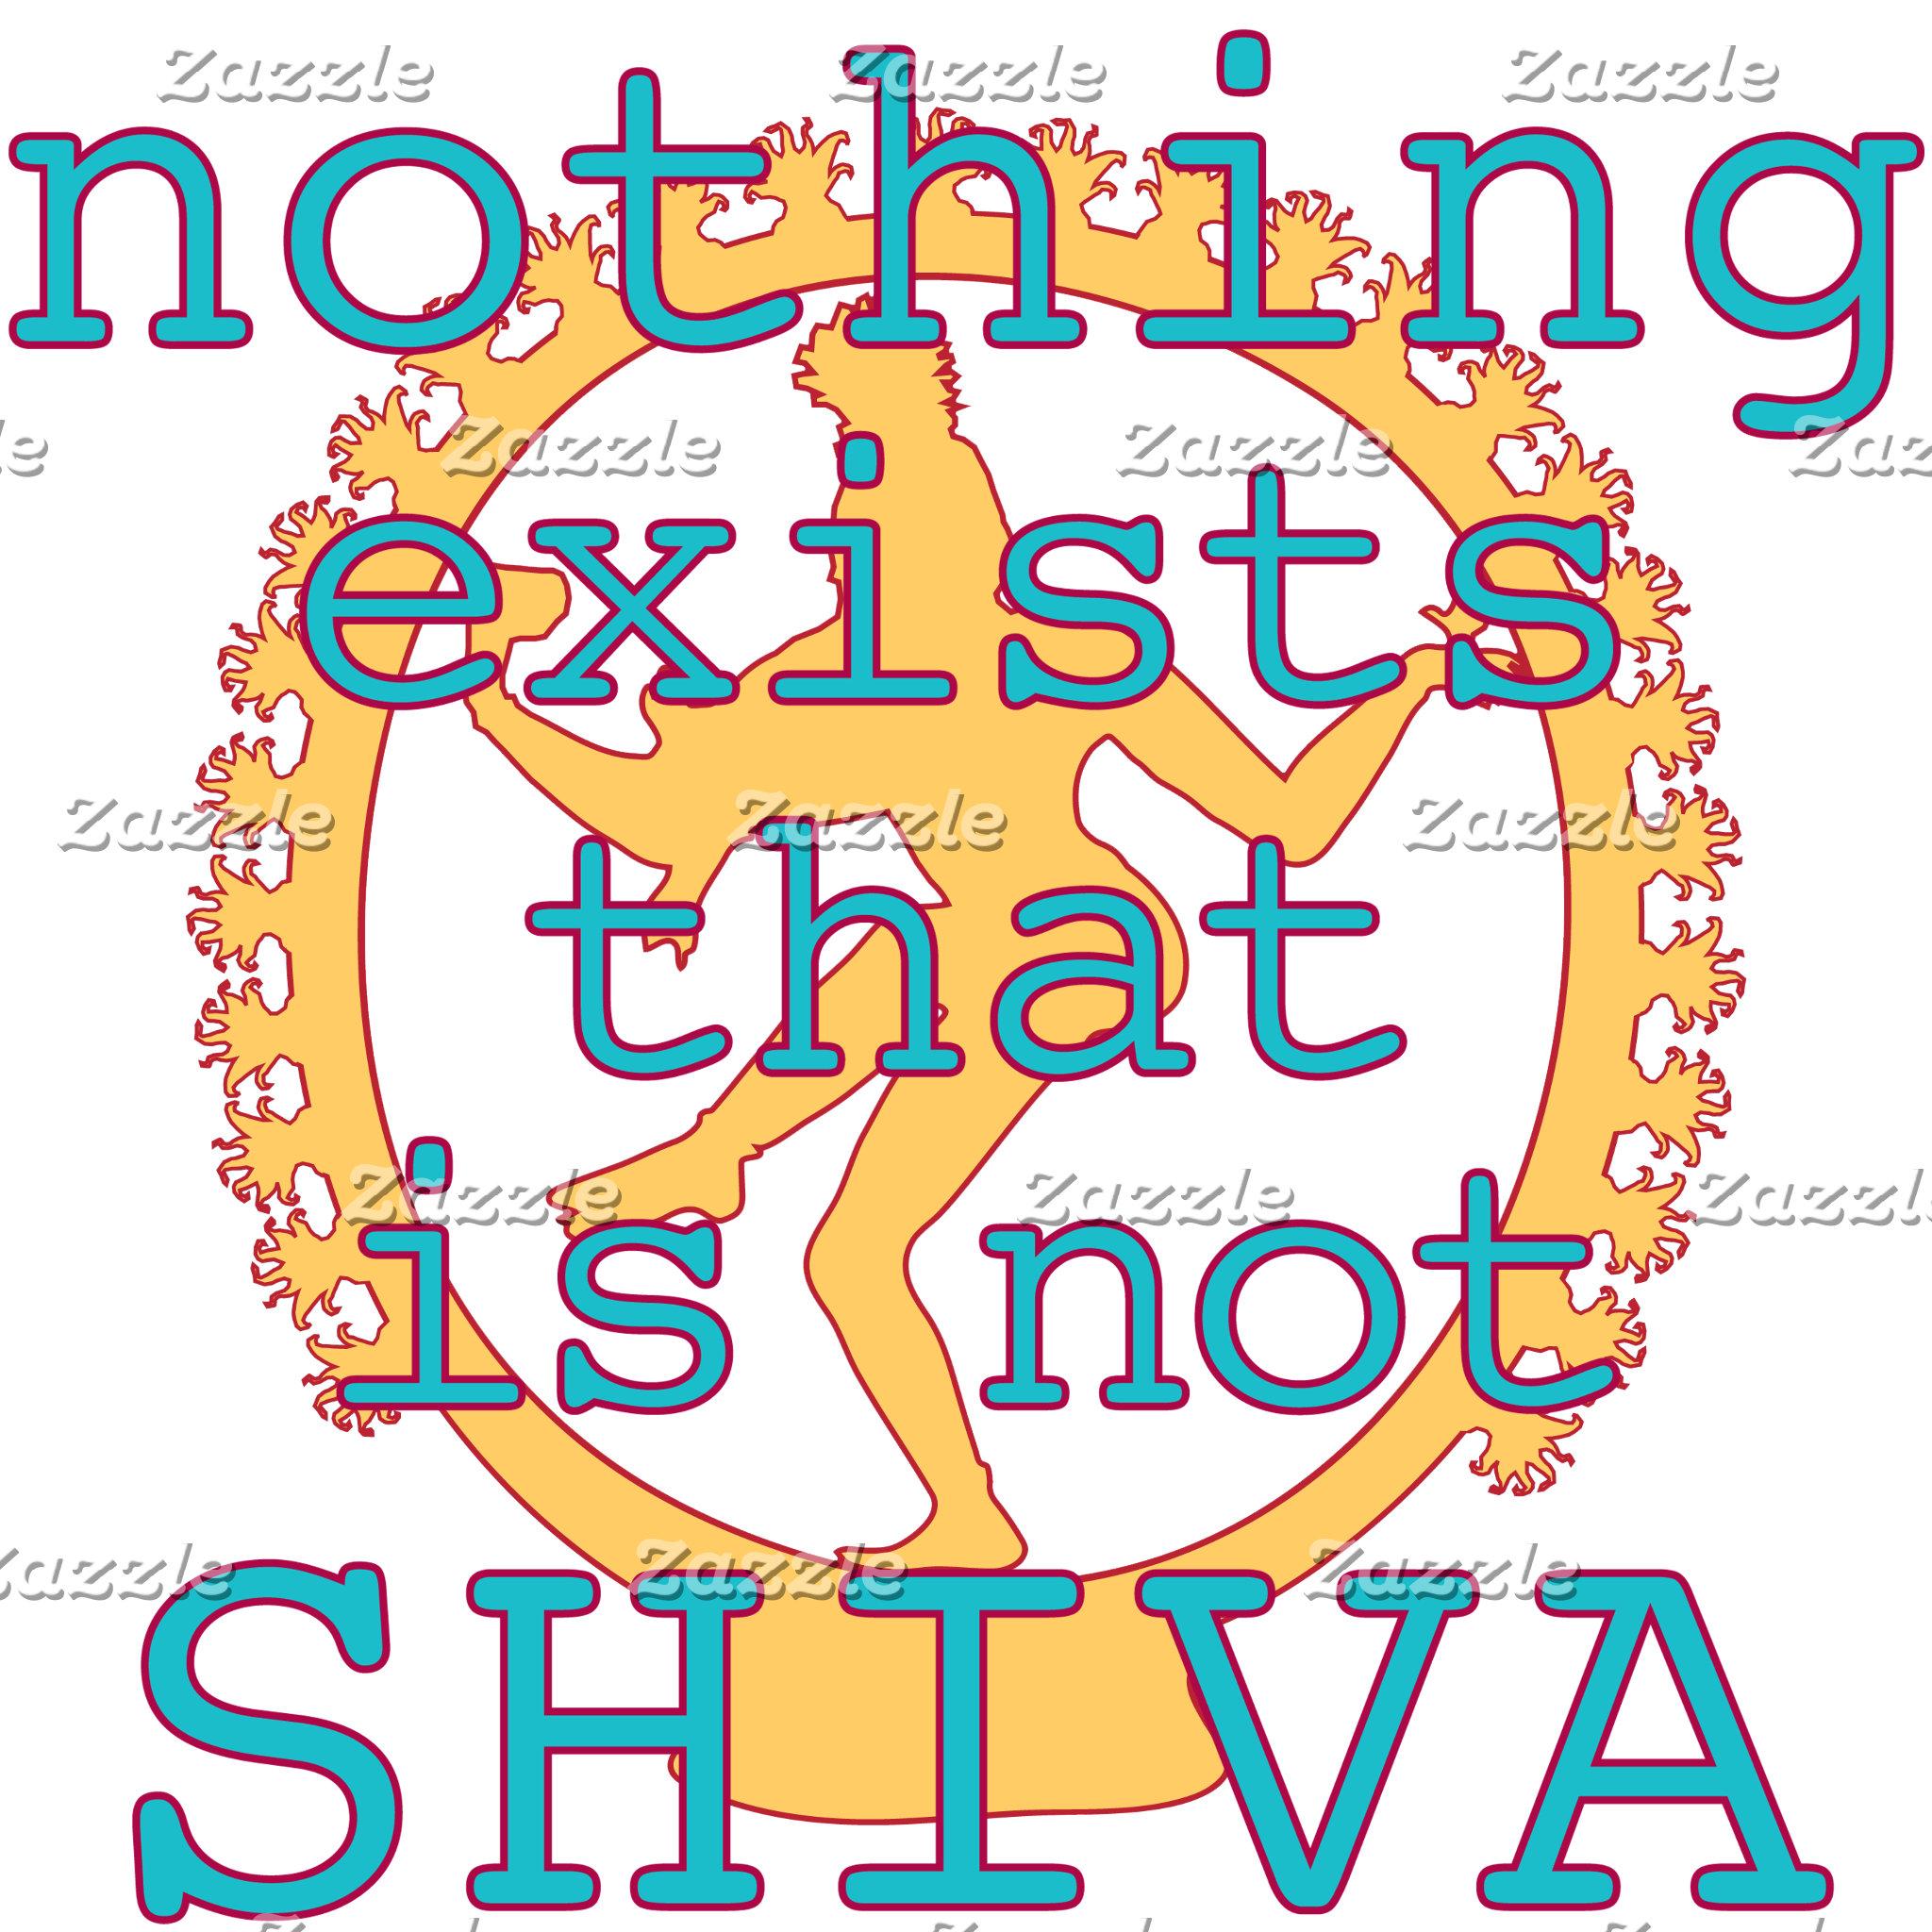 All Shiva!